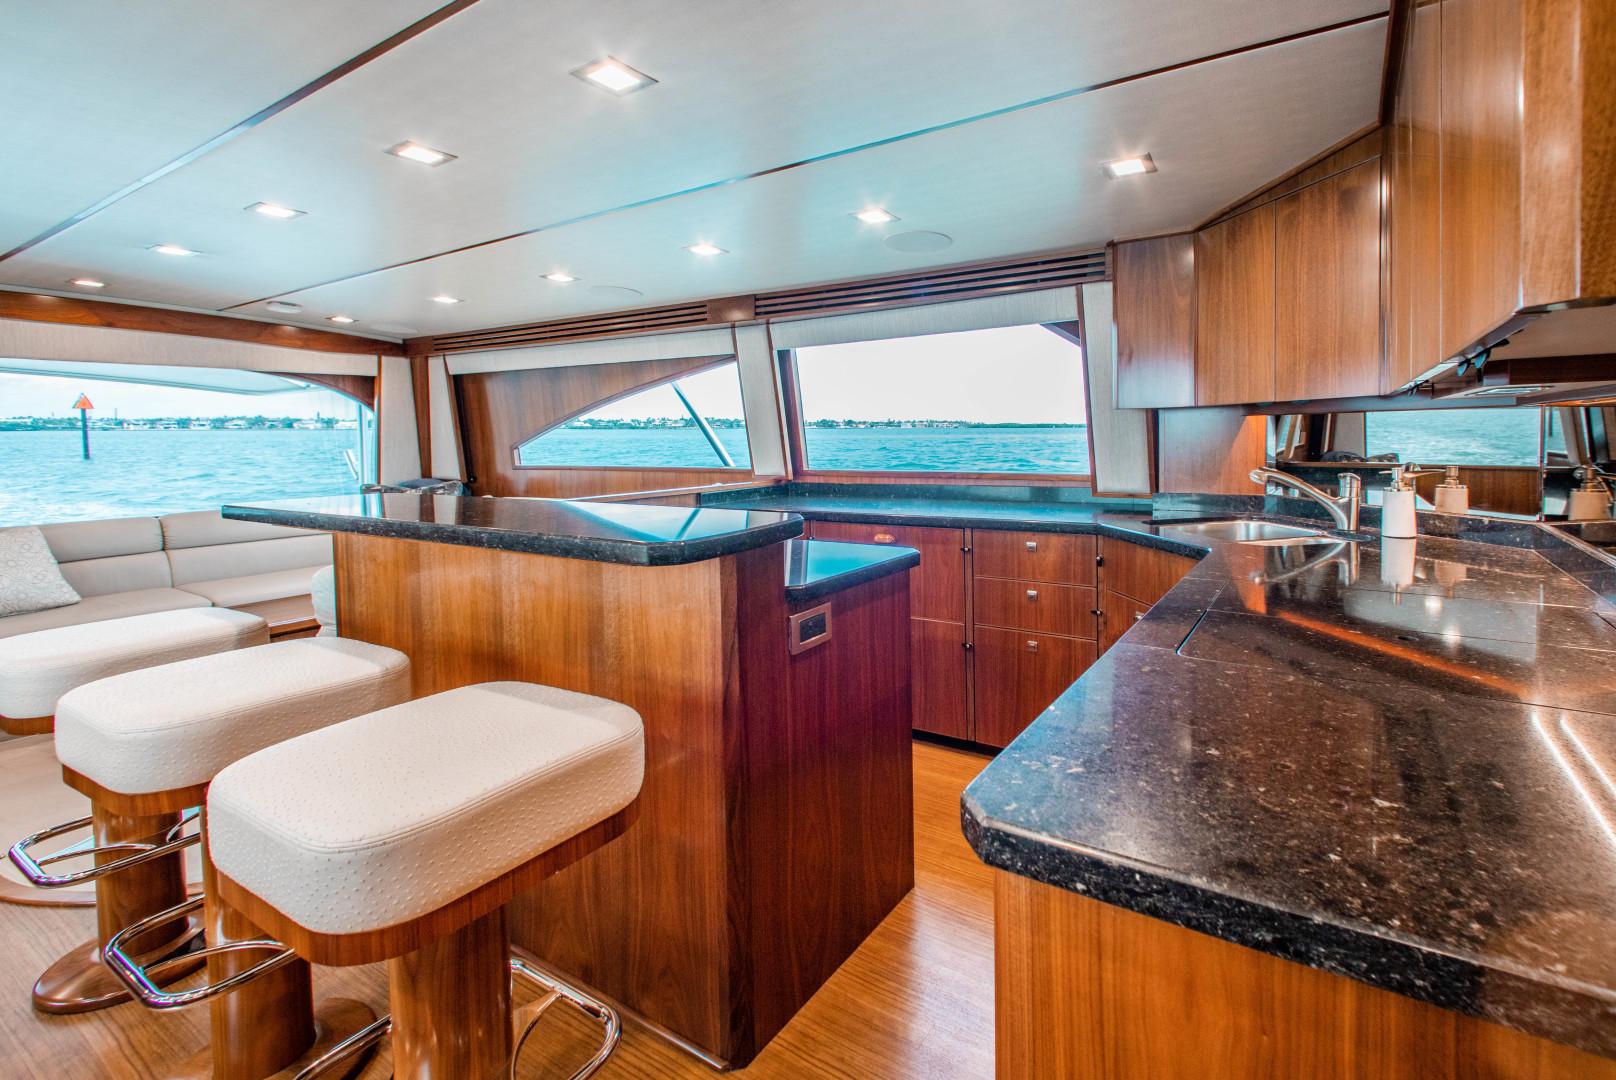 Viking-72 Enclosed Bridge 2018-Red Lion Ocean Reef-Florida-United States-2018 Viking 72 Enclosed Bridge  Red Lion  Galley-1568242   Thumbnail